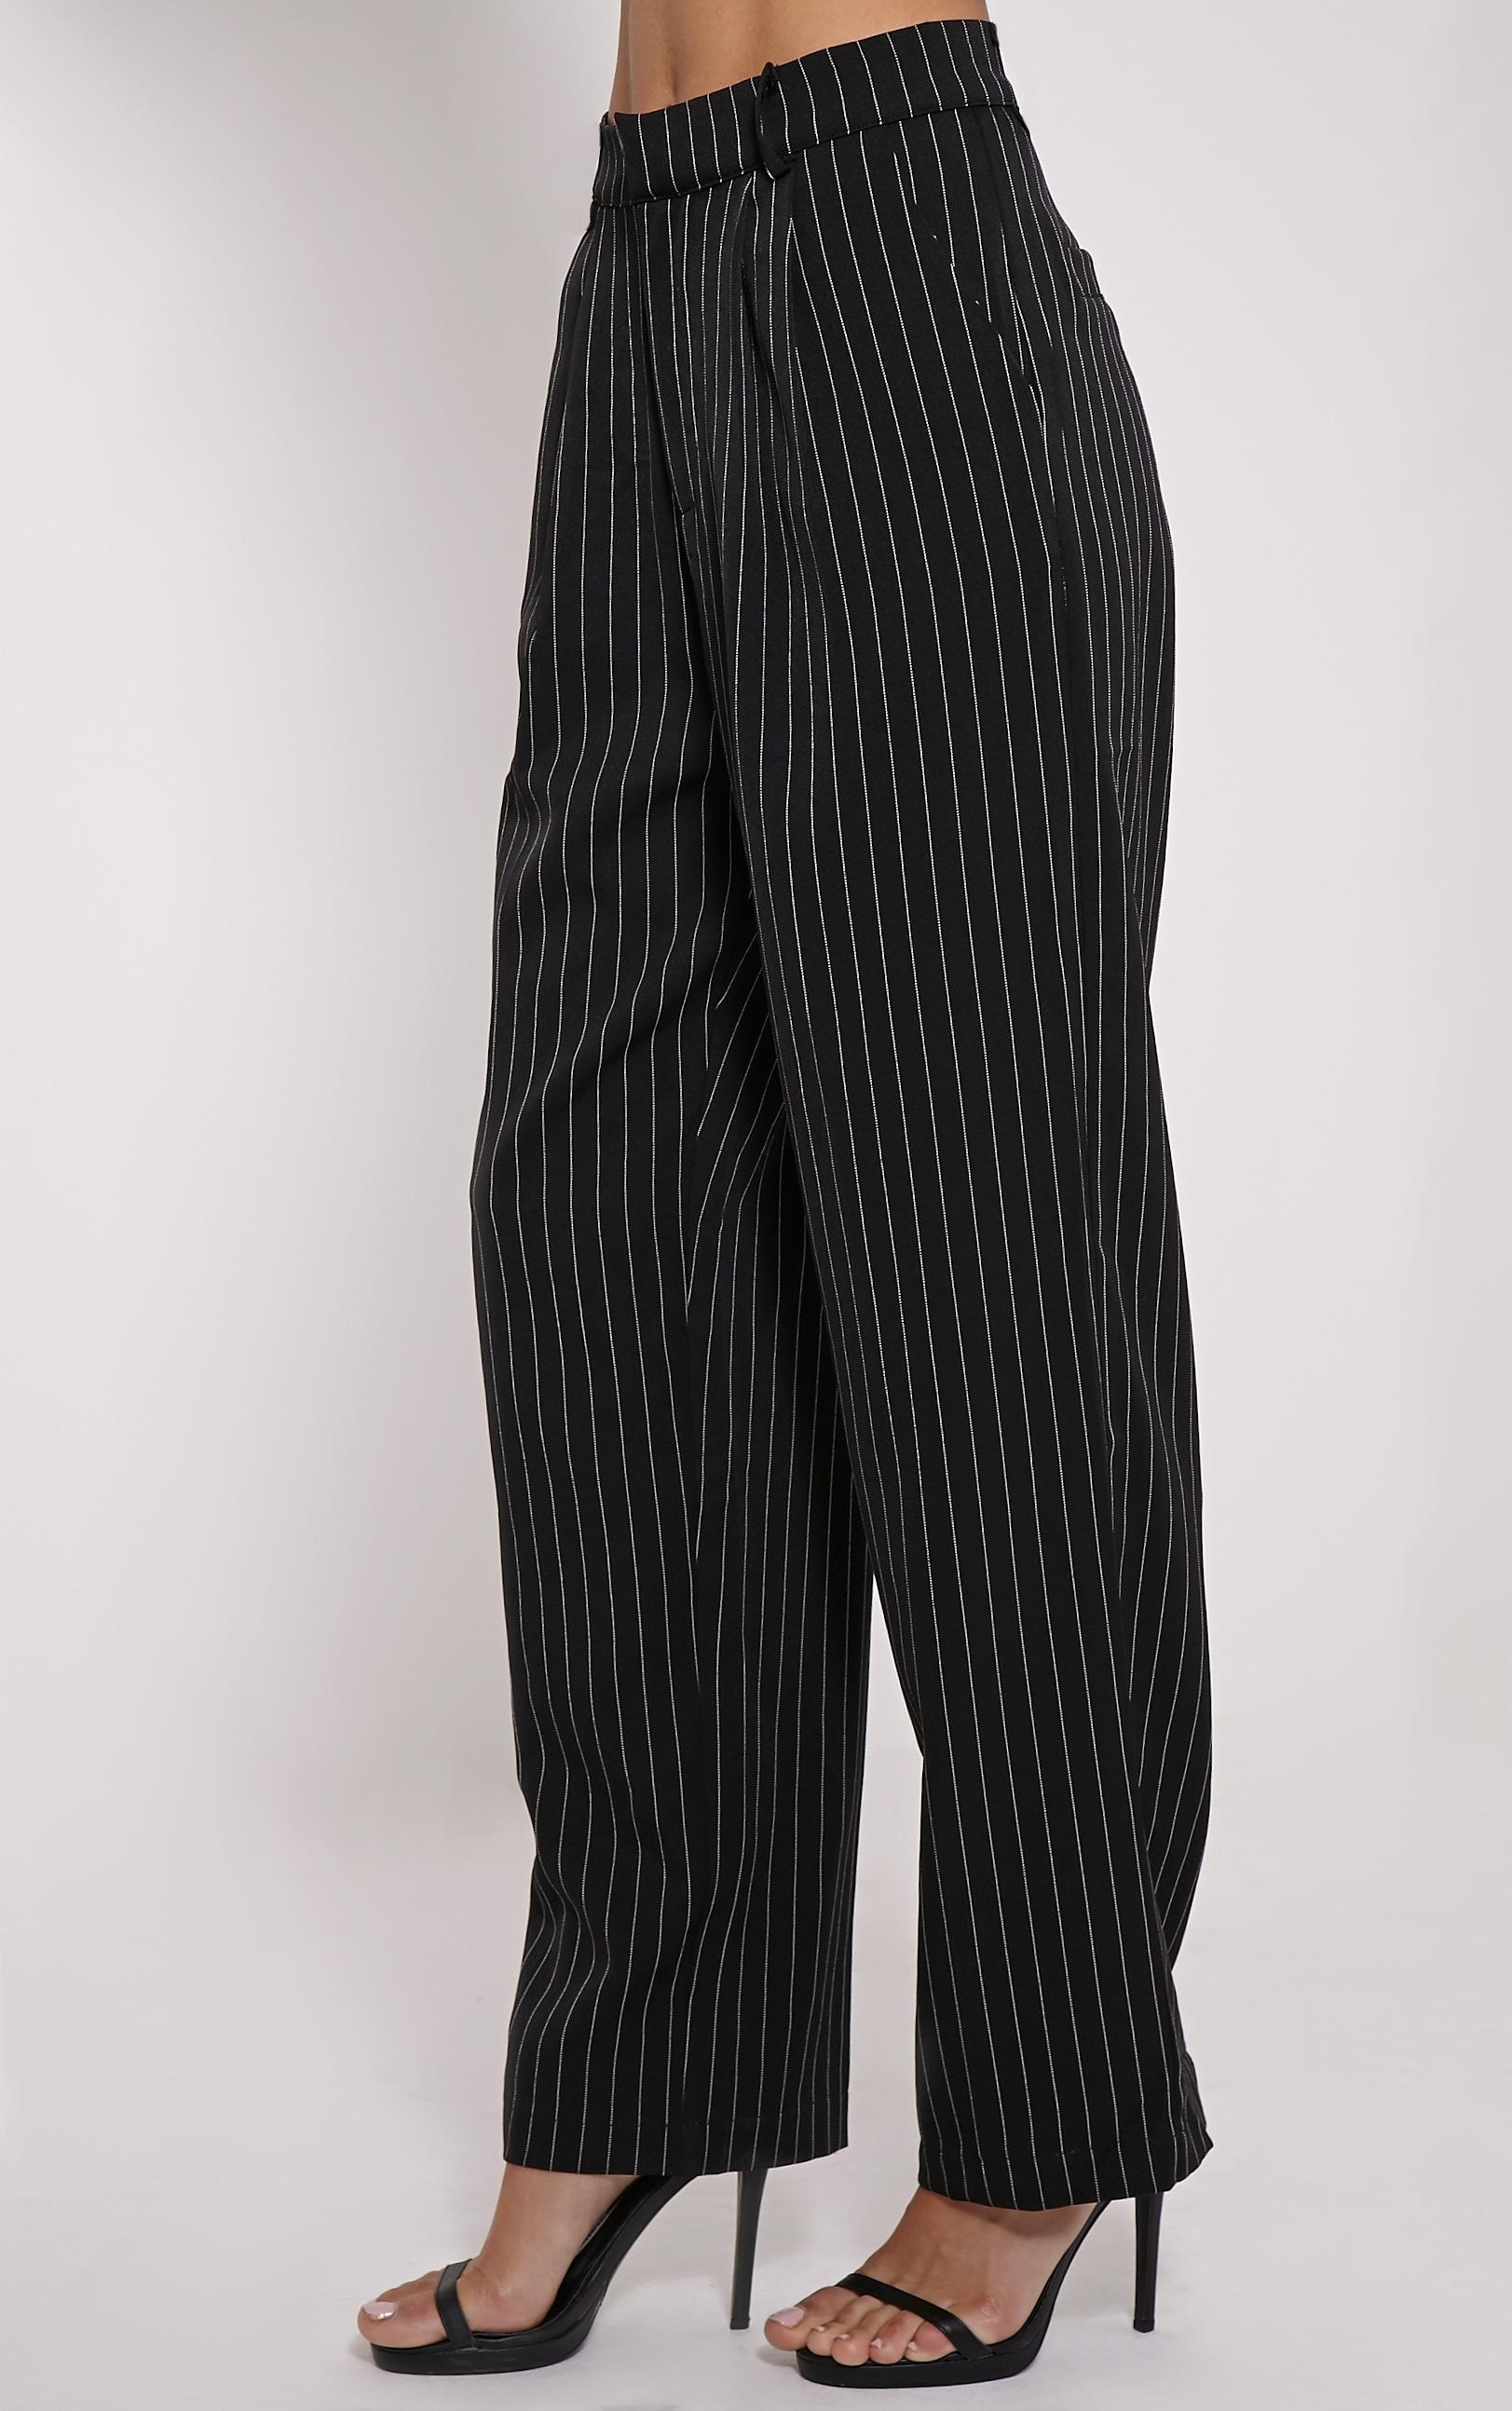 Adalyn Black Pinstripe Wide Leg Trousers 3